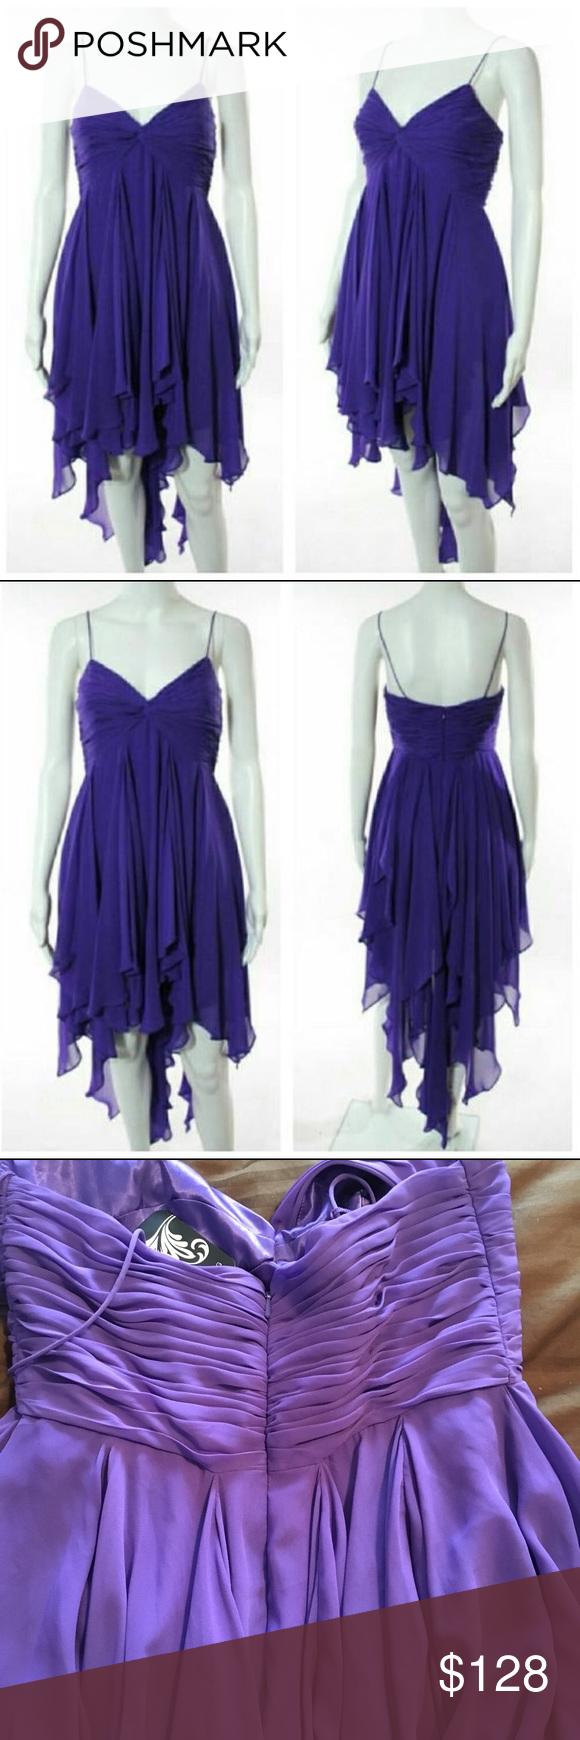 Aidan Mattox Purple Layered Cocktail Dress NWT